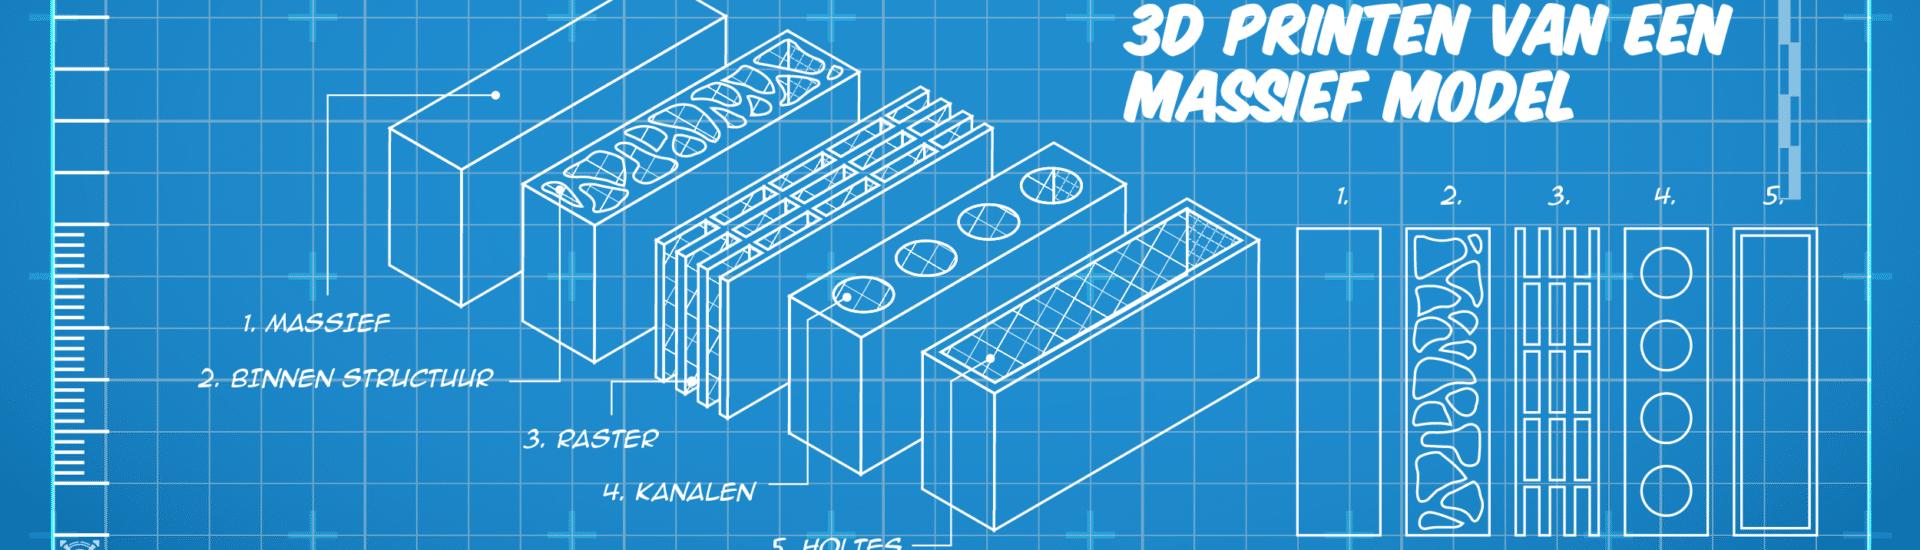 Oceanz 3D Printing Design Tip nr 4